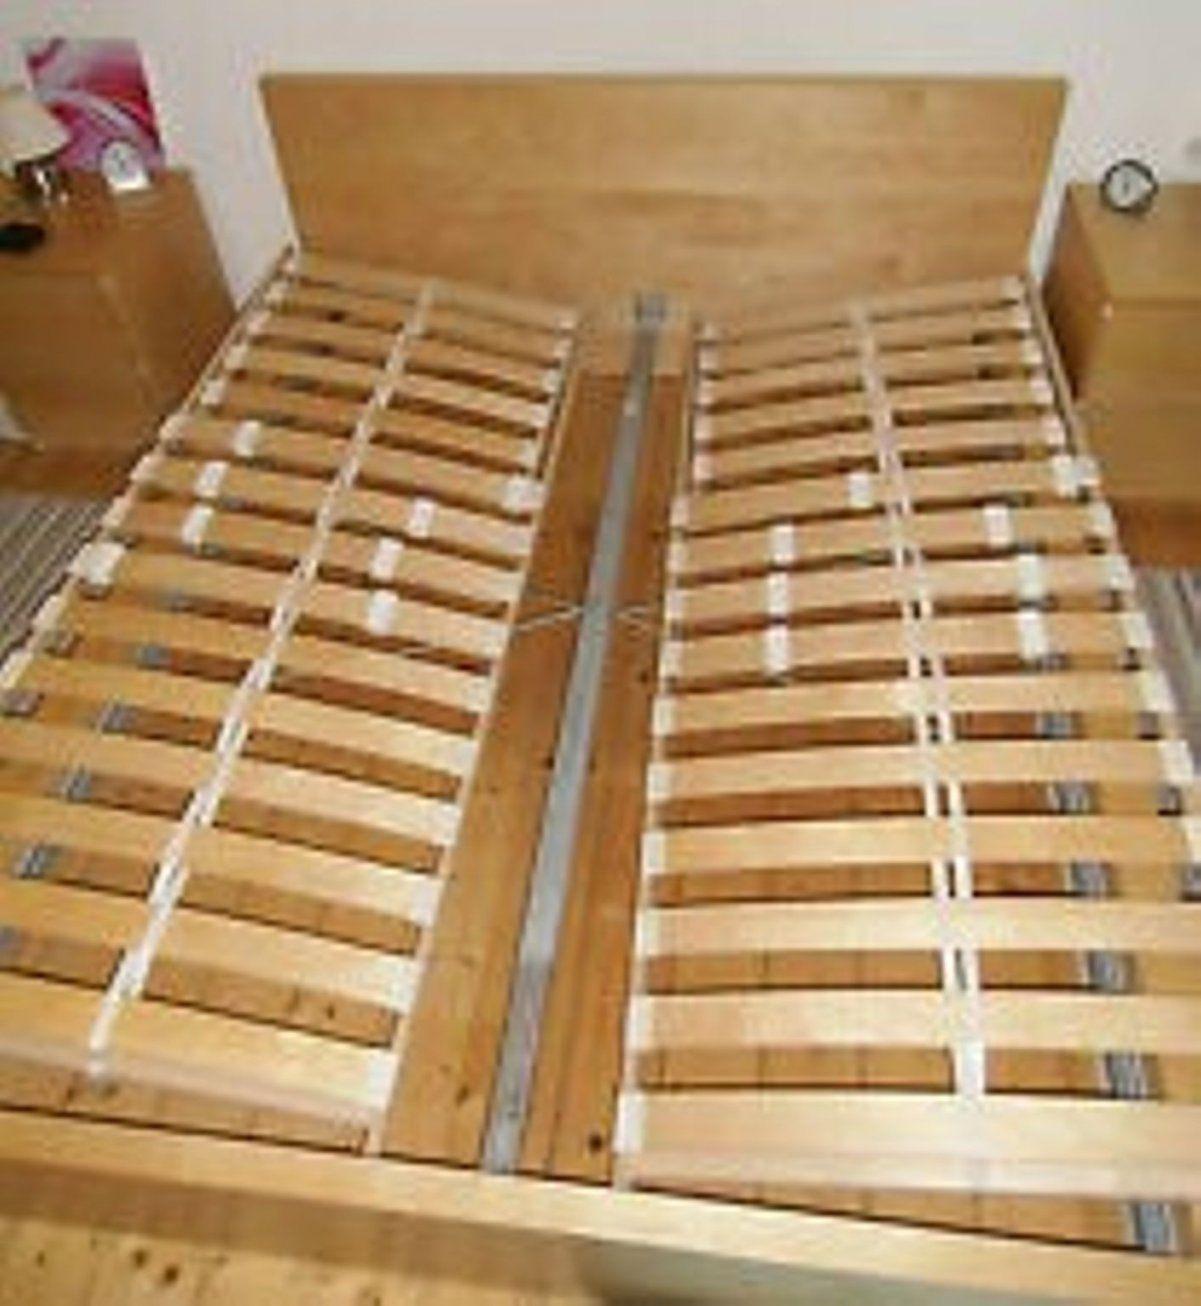 Bettgestell Lattenrost B06xxtb628 Vidaxl Kunstlederbett